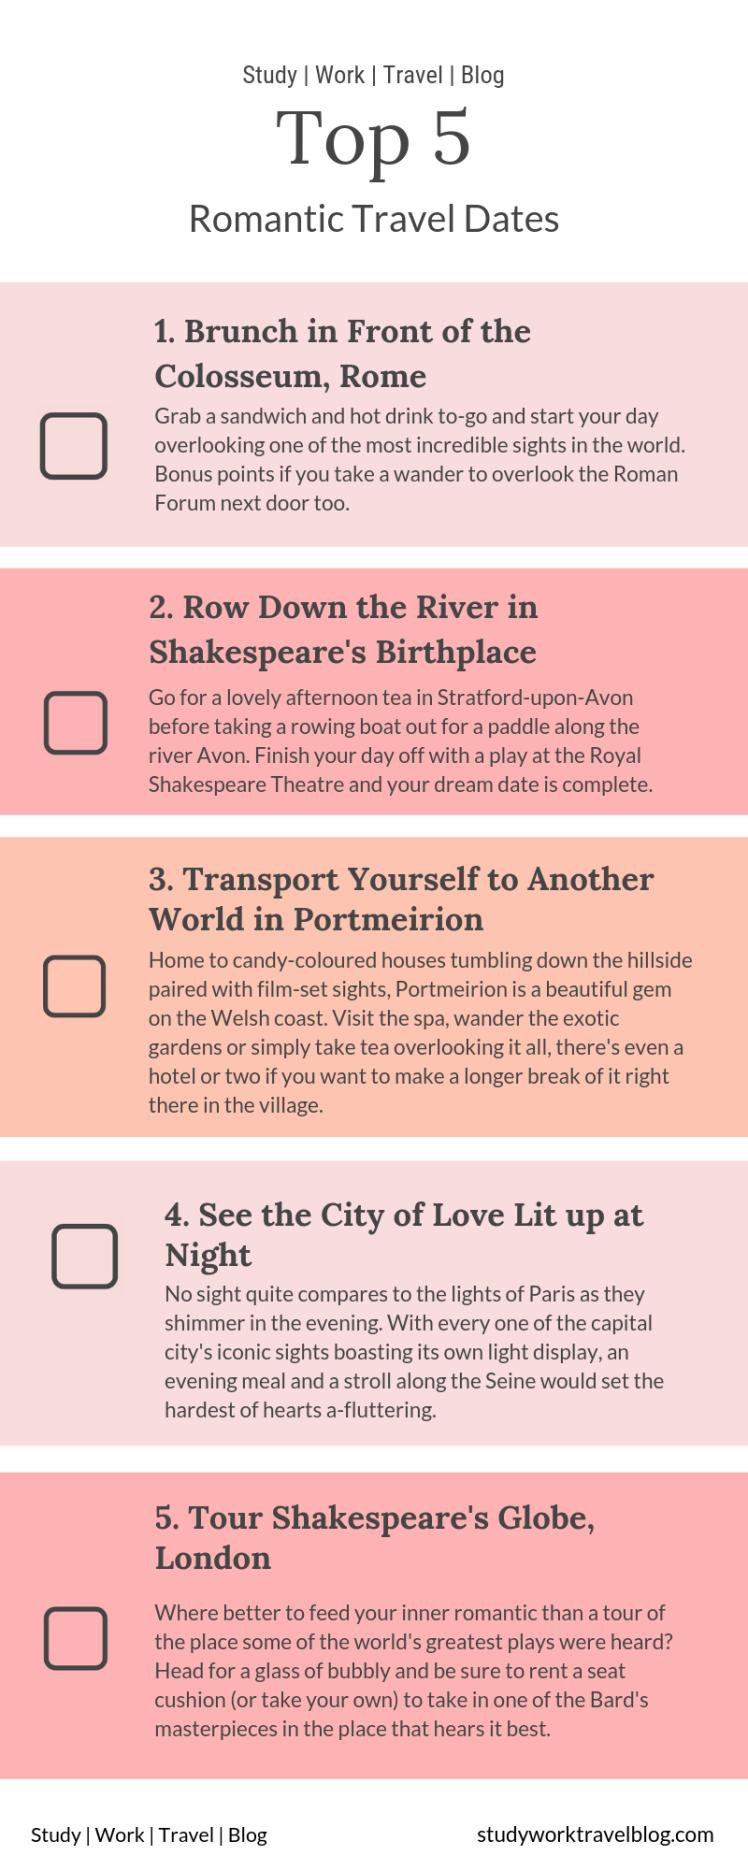 Top 5 romantic travel dates infographic